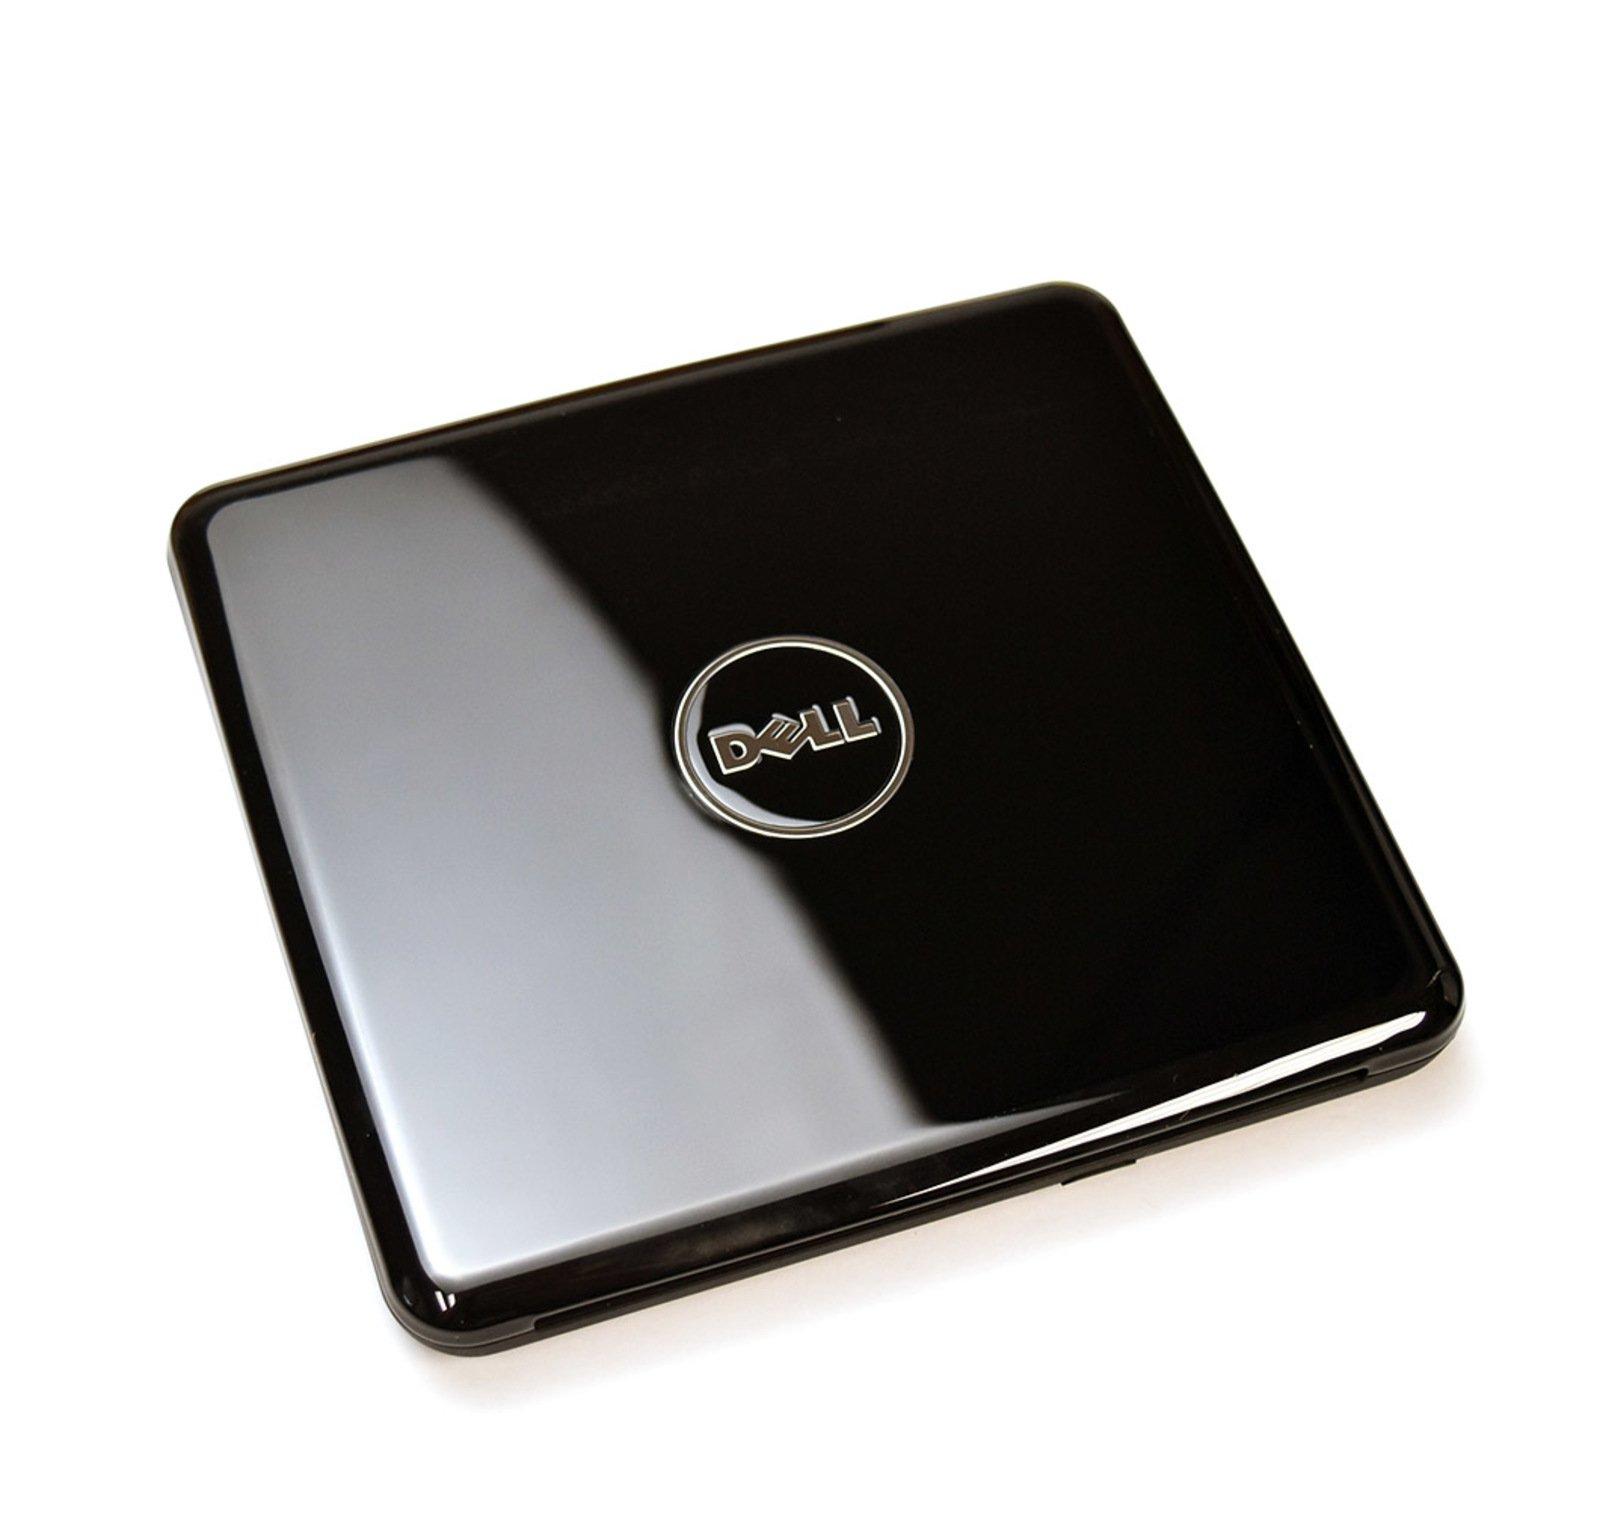 New GX10N Genuine Dell GPK9C OEM USB Optical Drive External USB DVDRW Drive ODD Multi-Recording LGE-DMGP60N(B) CTYDR RJHFR 5GTT7 8H1N5 RVX09 X130M GP60N DVD+/-RW HLDS